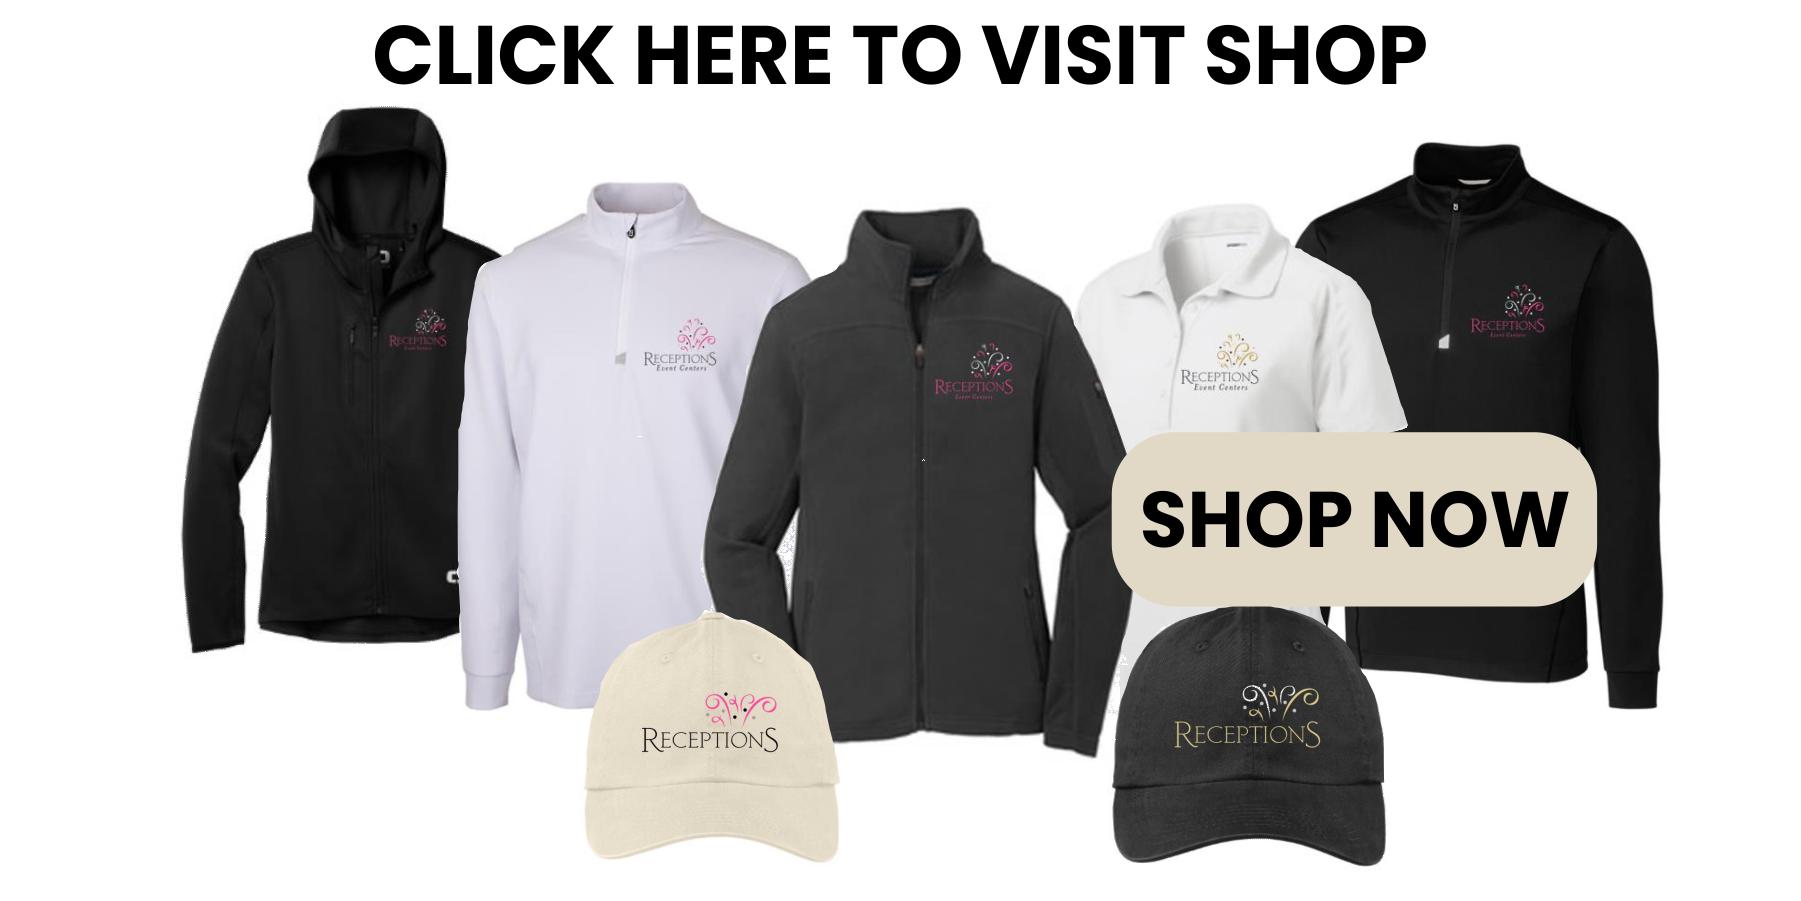 receptions-event-centers-apparel-shop.png